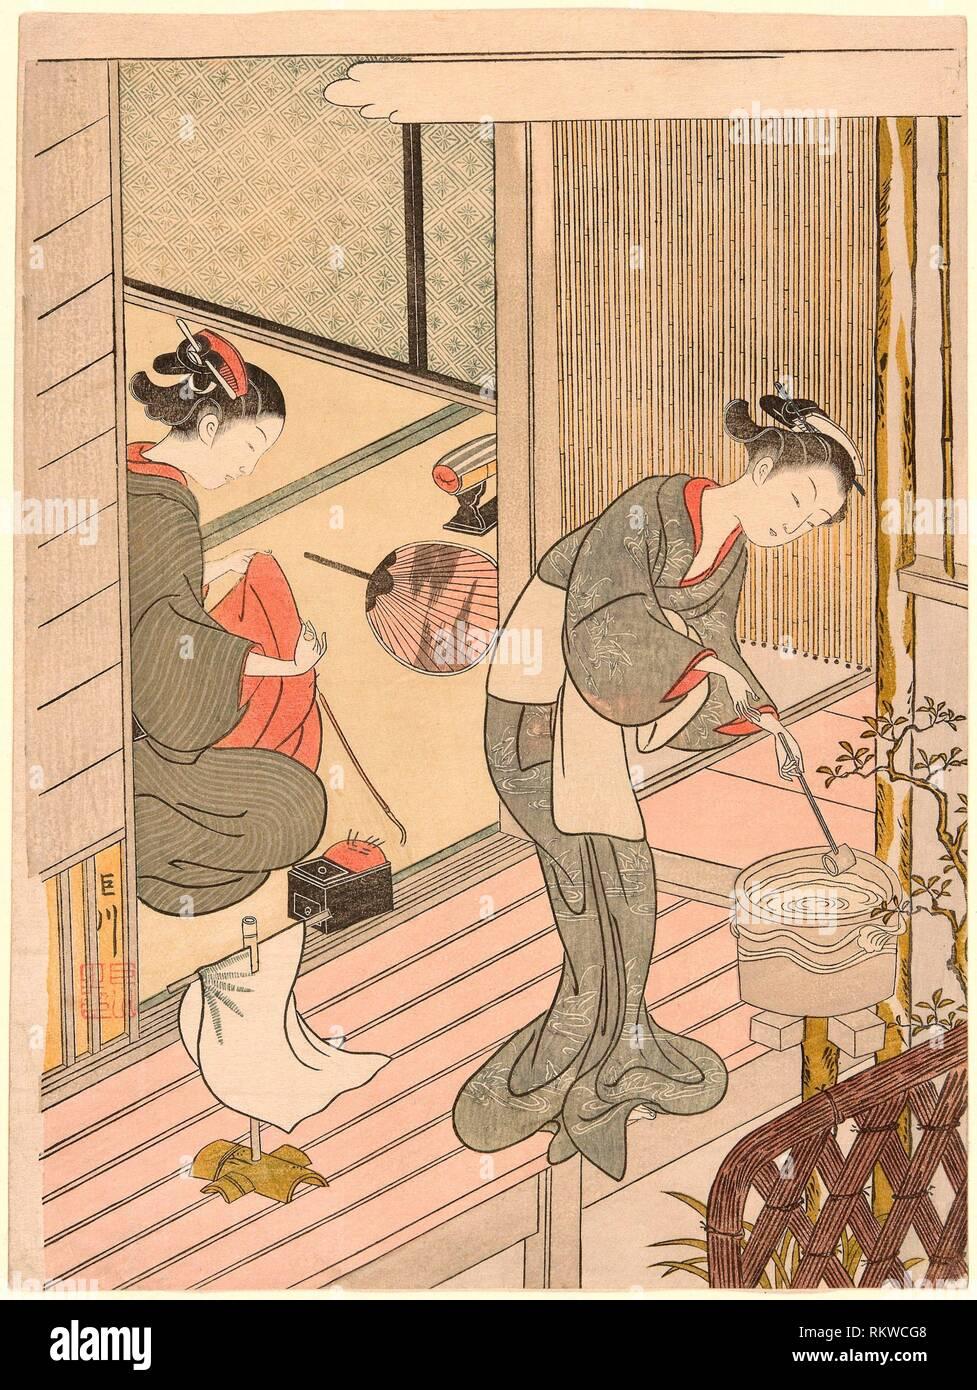 Returning Sails of the Towel Rack (Tenugui-kake no kihan), from the series ''Eight Views of the Parlor (Zashiki hakkei)'' - c. 1766 - Suzuki Harunobu - Stock Image